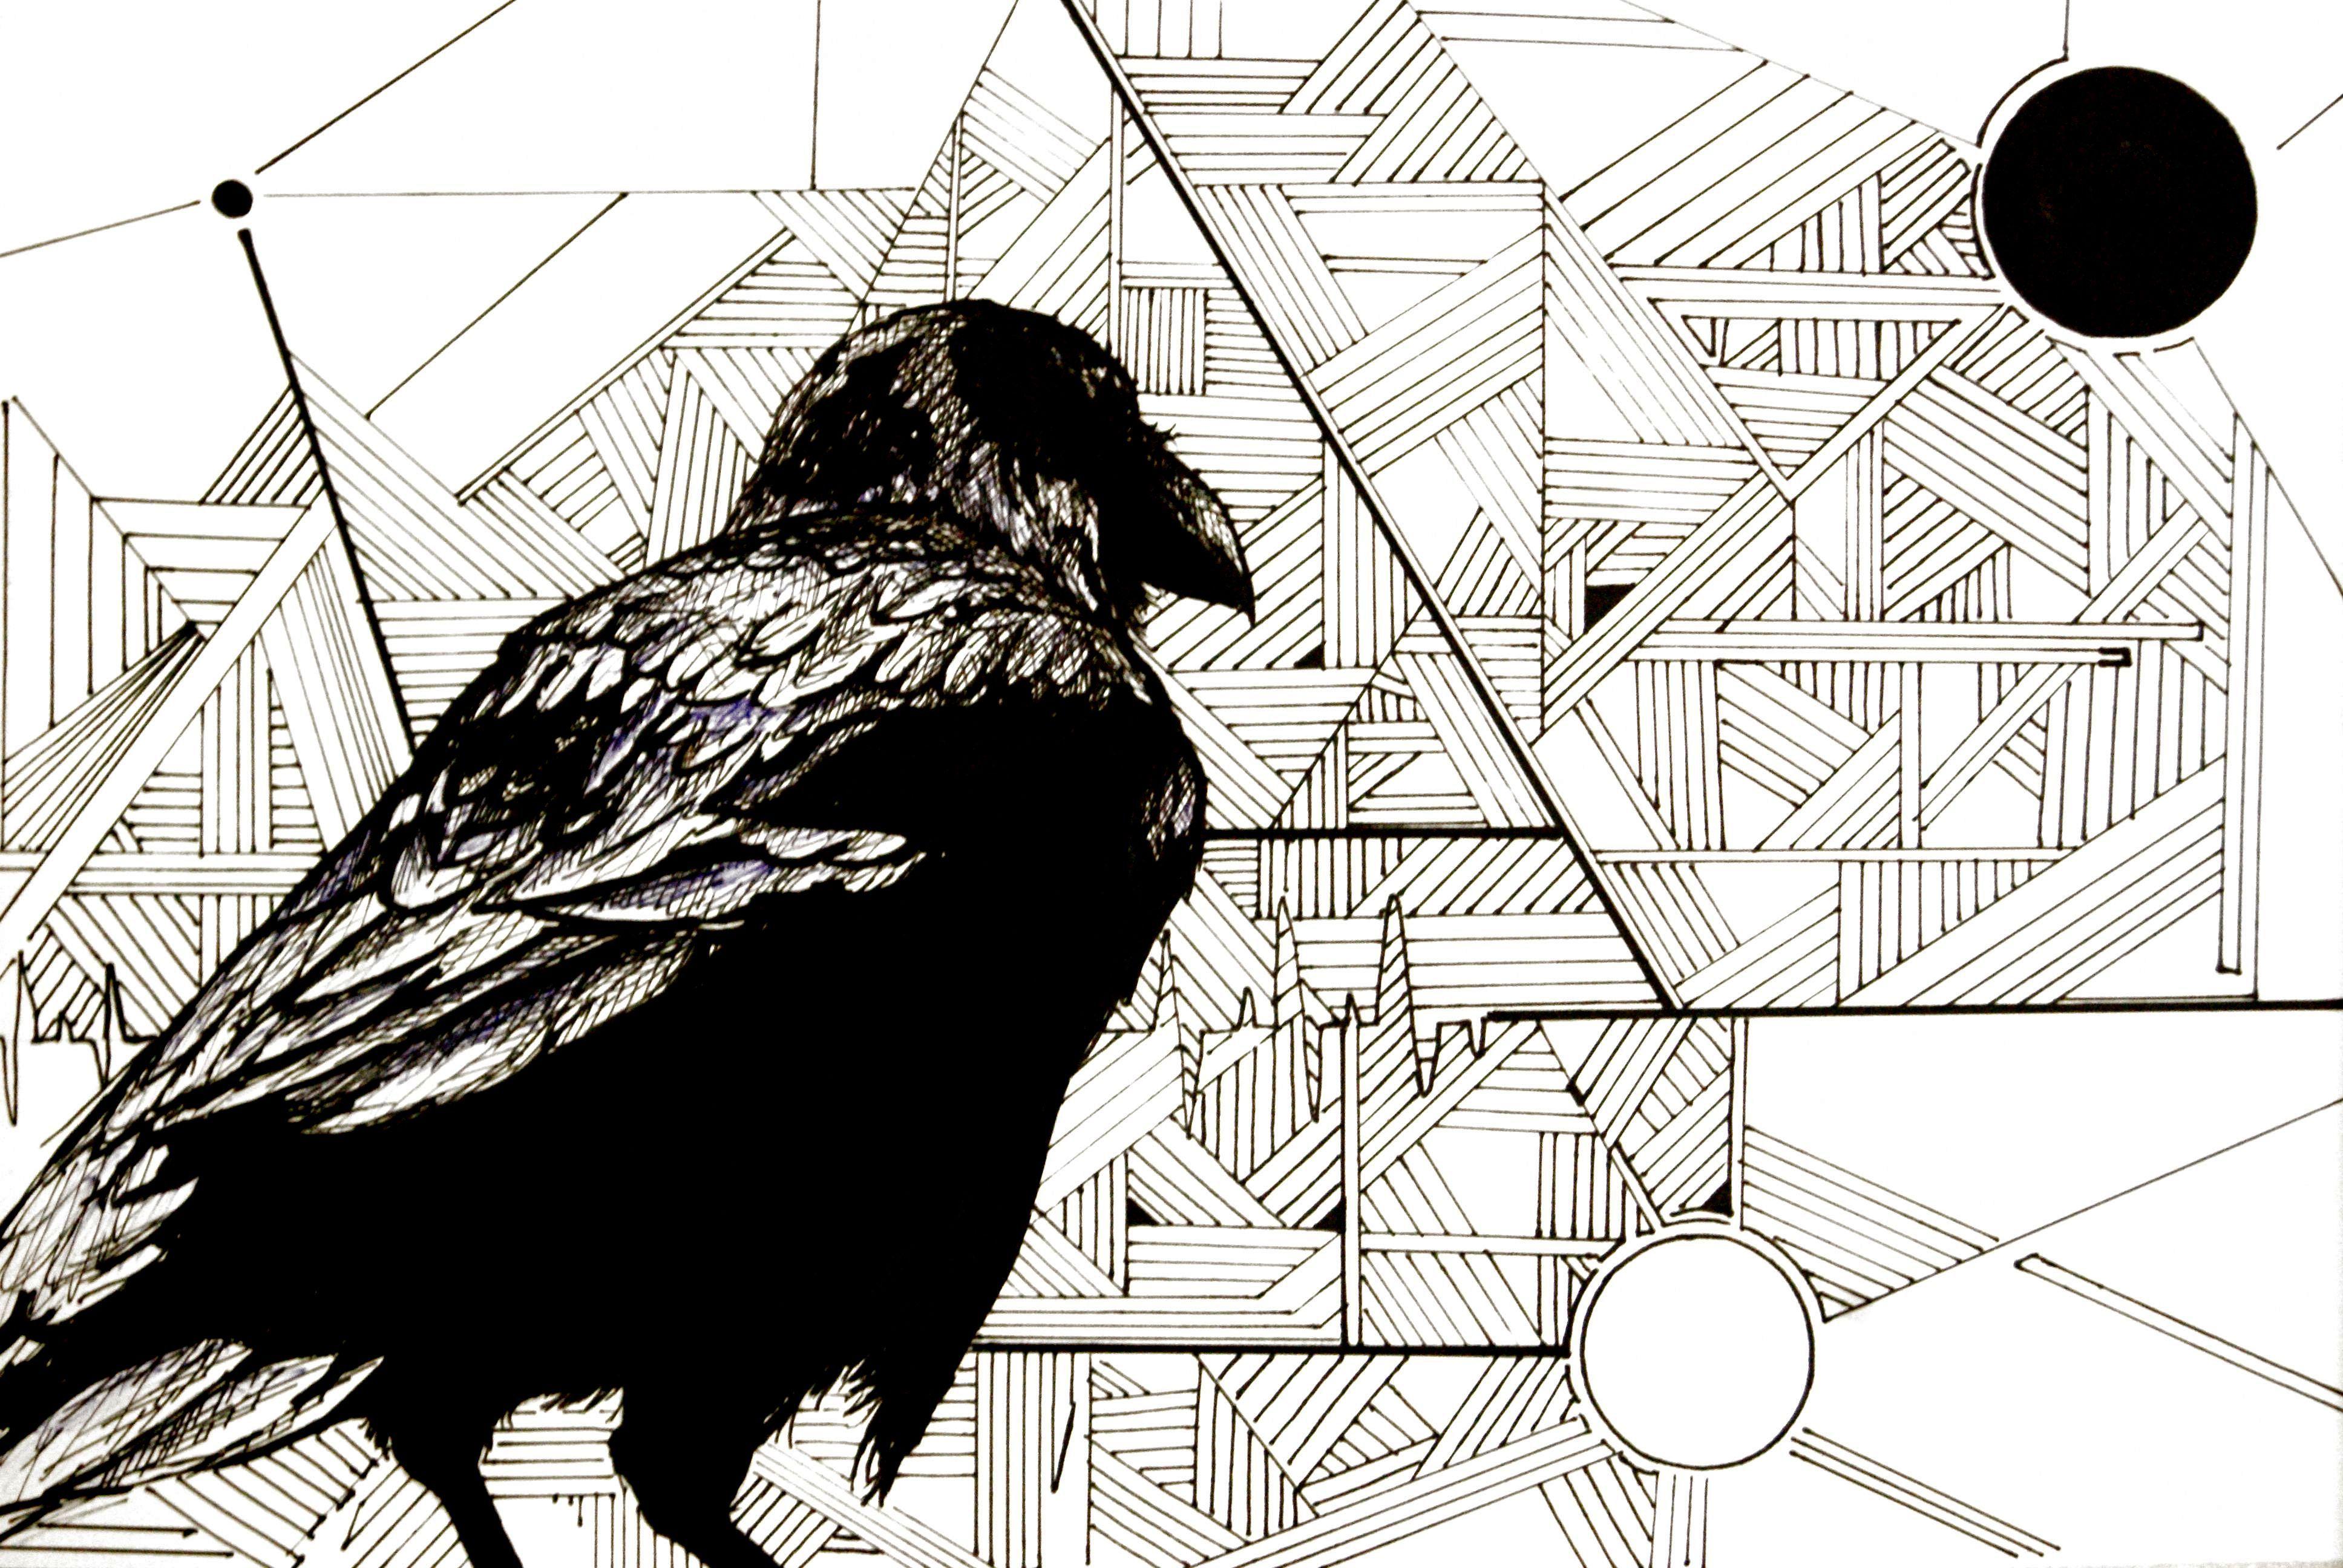 muerte. tinta sobre papel